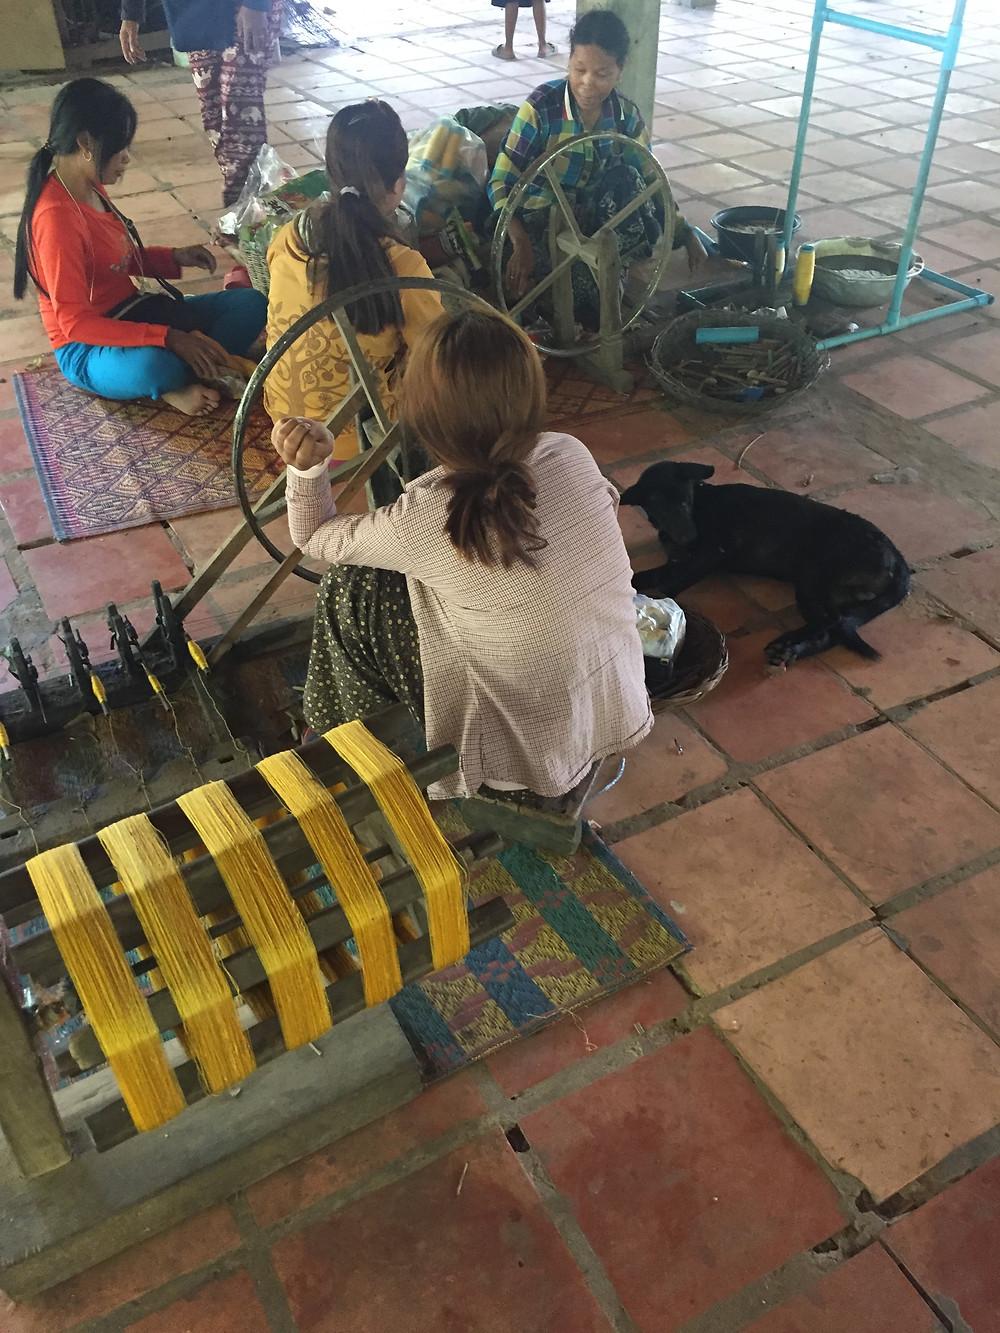 Workshop IKTT women, children, men (and dogs) live and work here